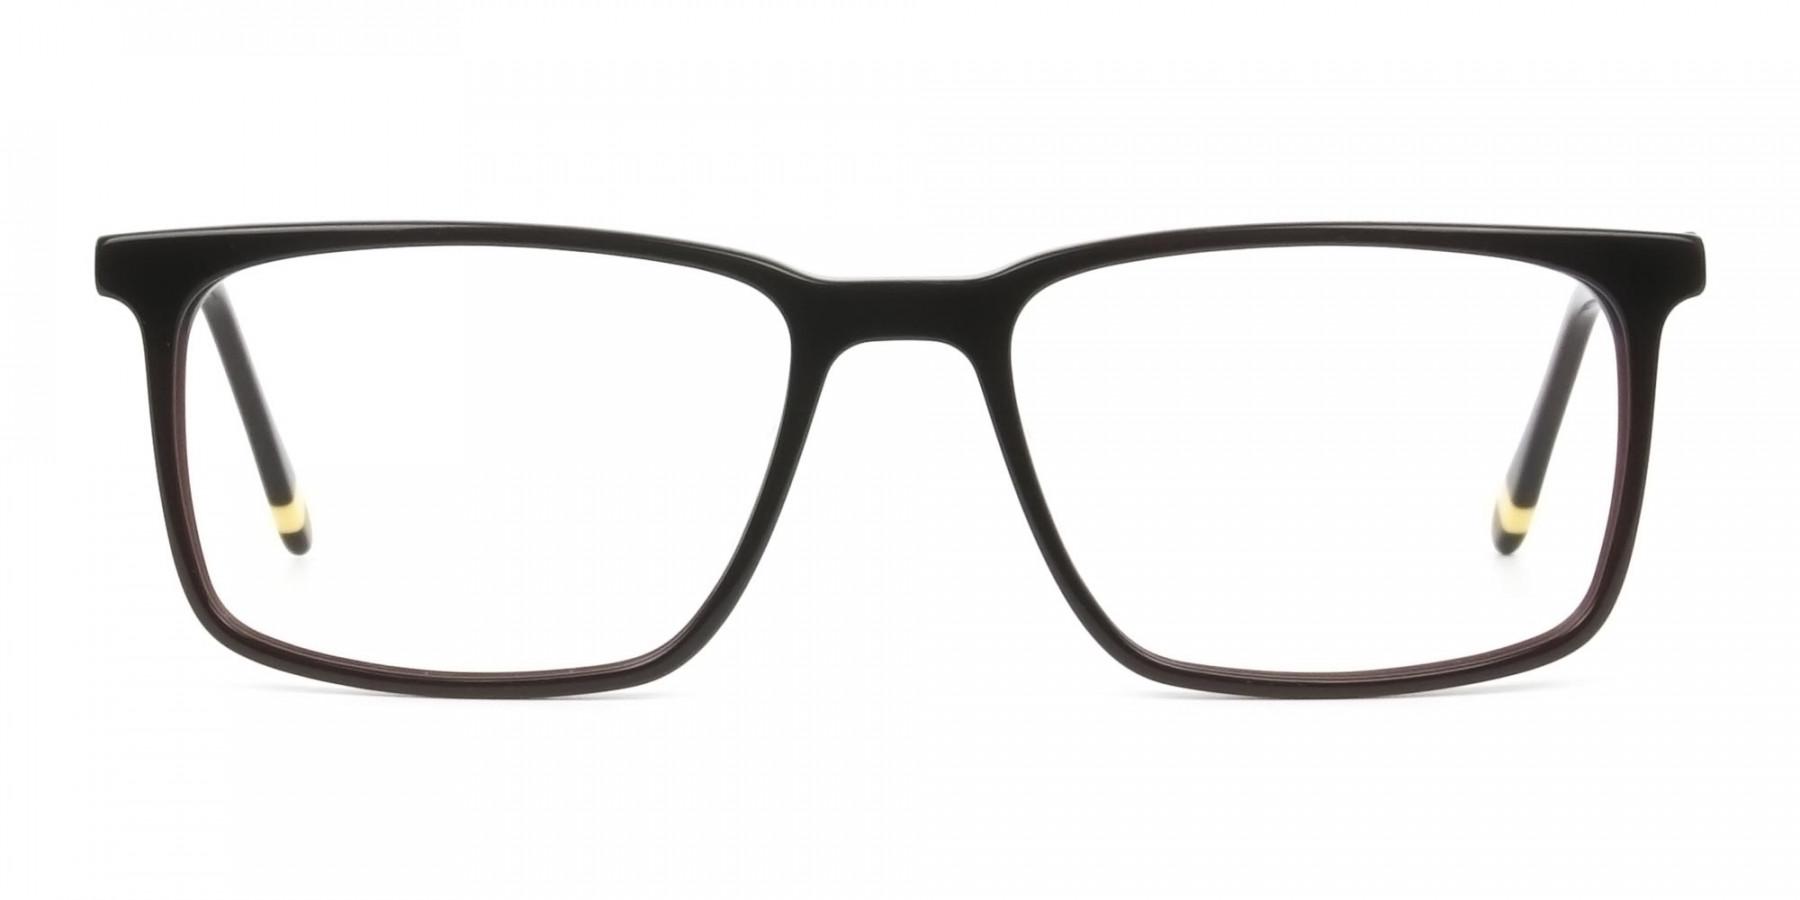 Designer Dark Brown Glasses Rectangular - 1